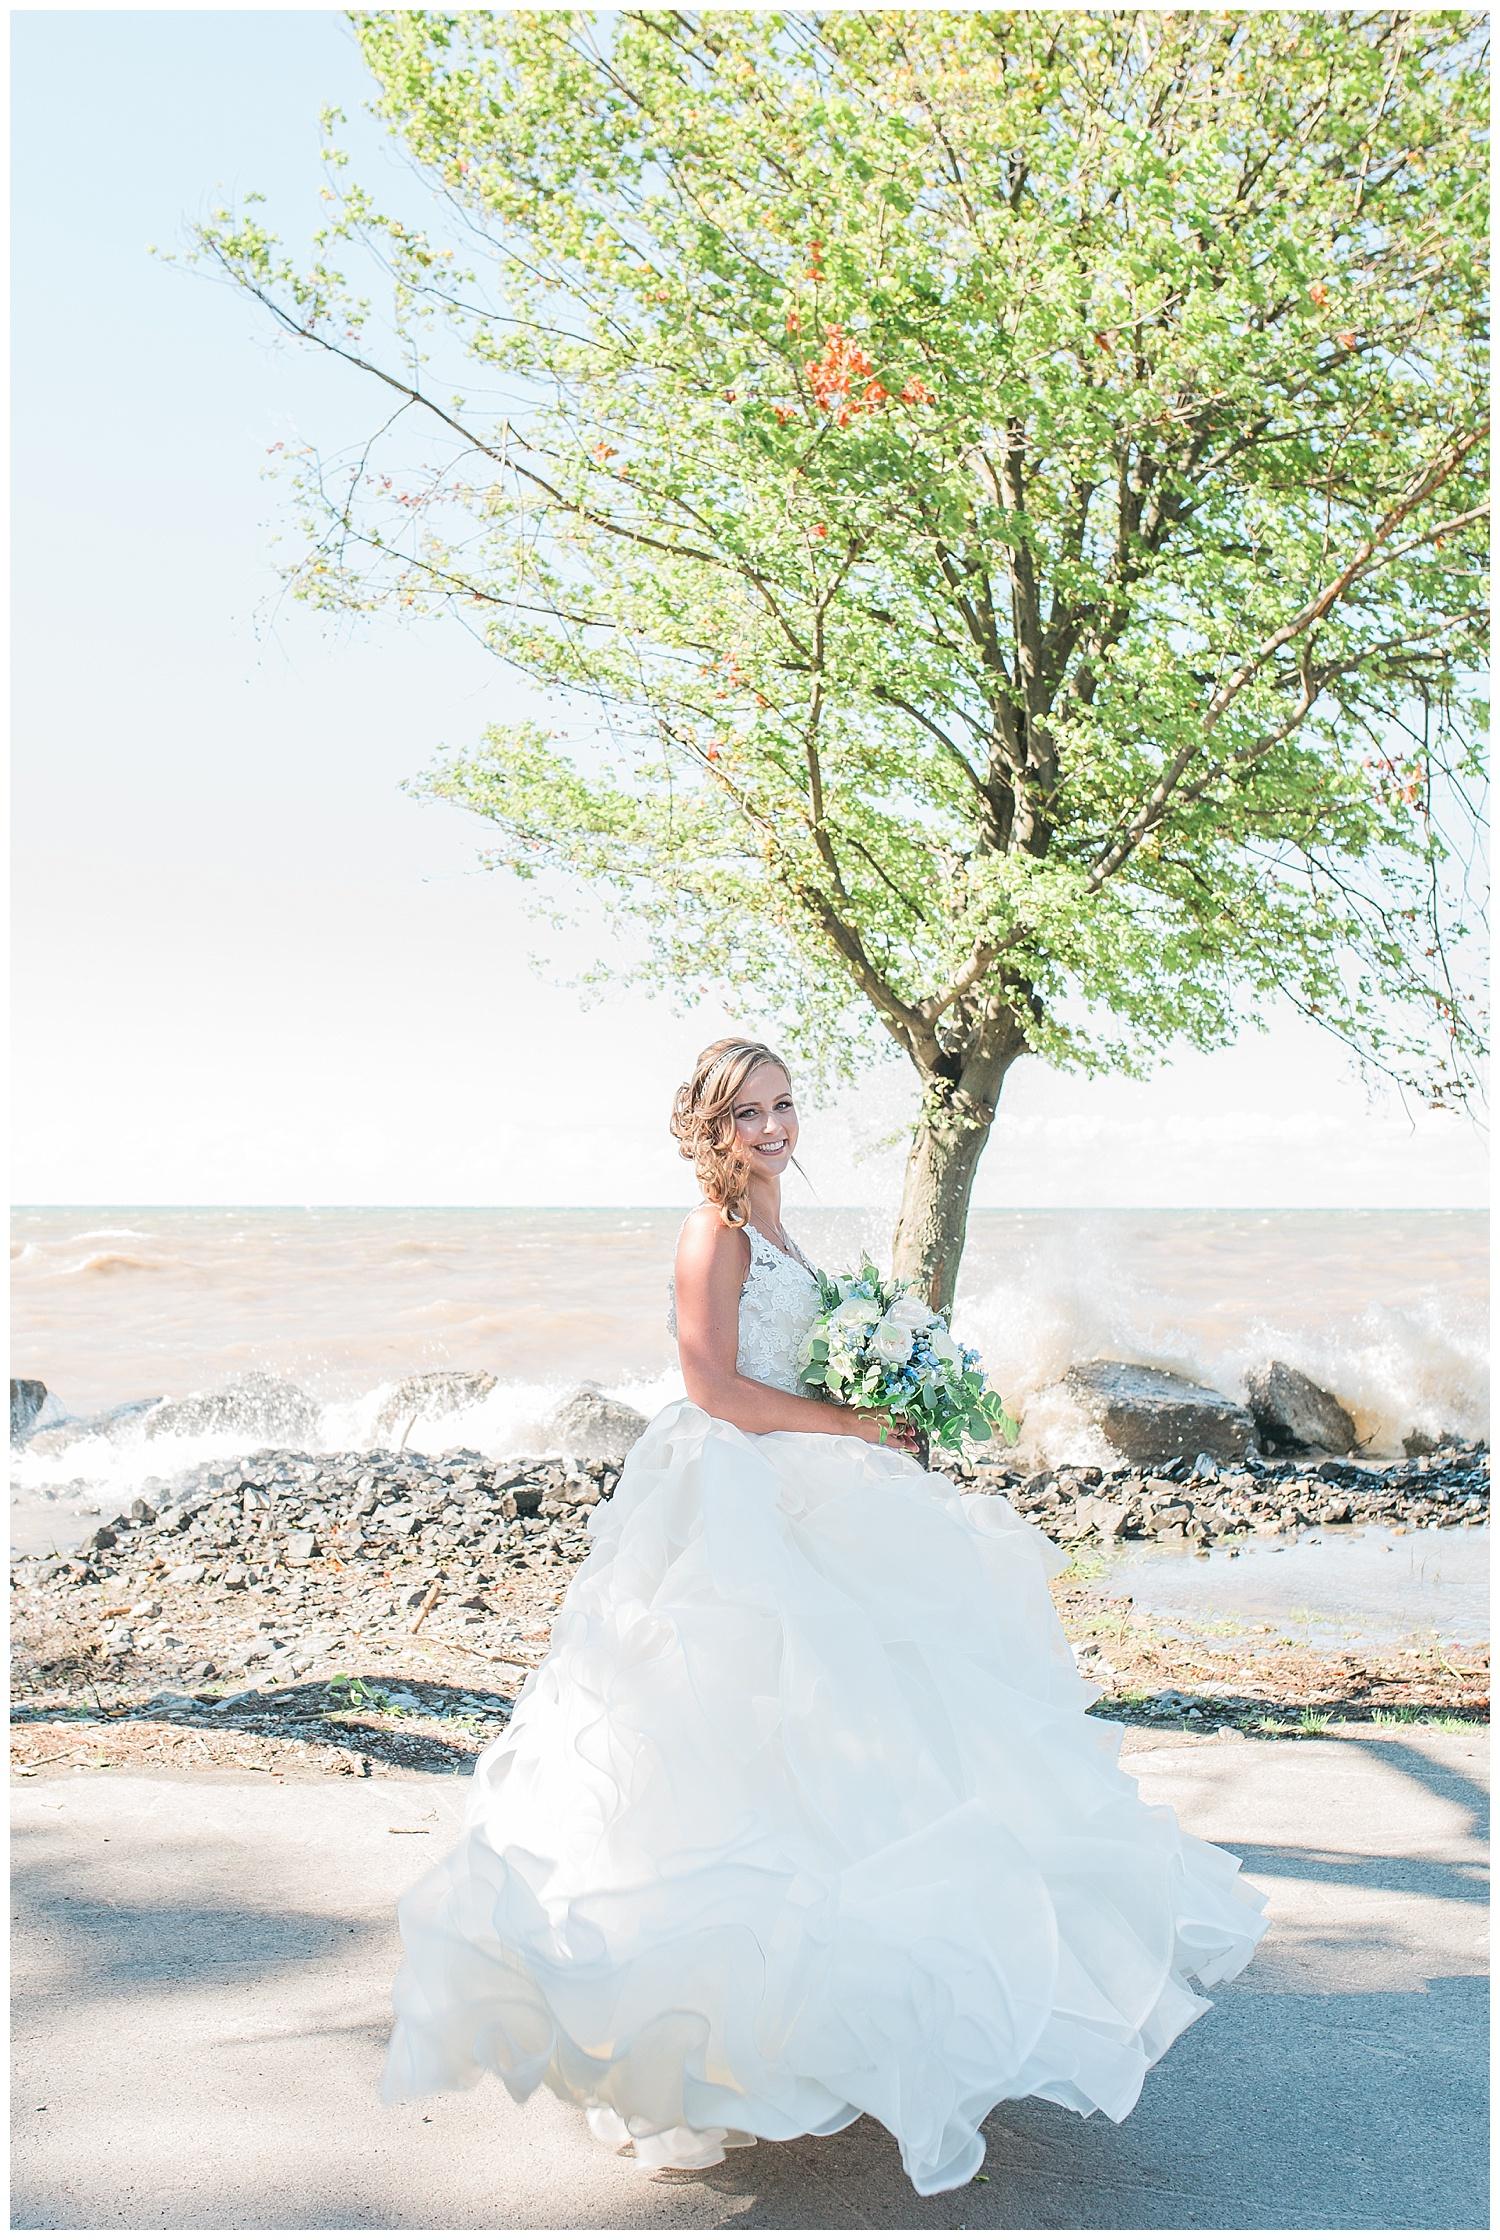 Sean and Andrea - Webster wedding - lass and beau-355_Buffalo wedding photography.jpg